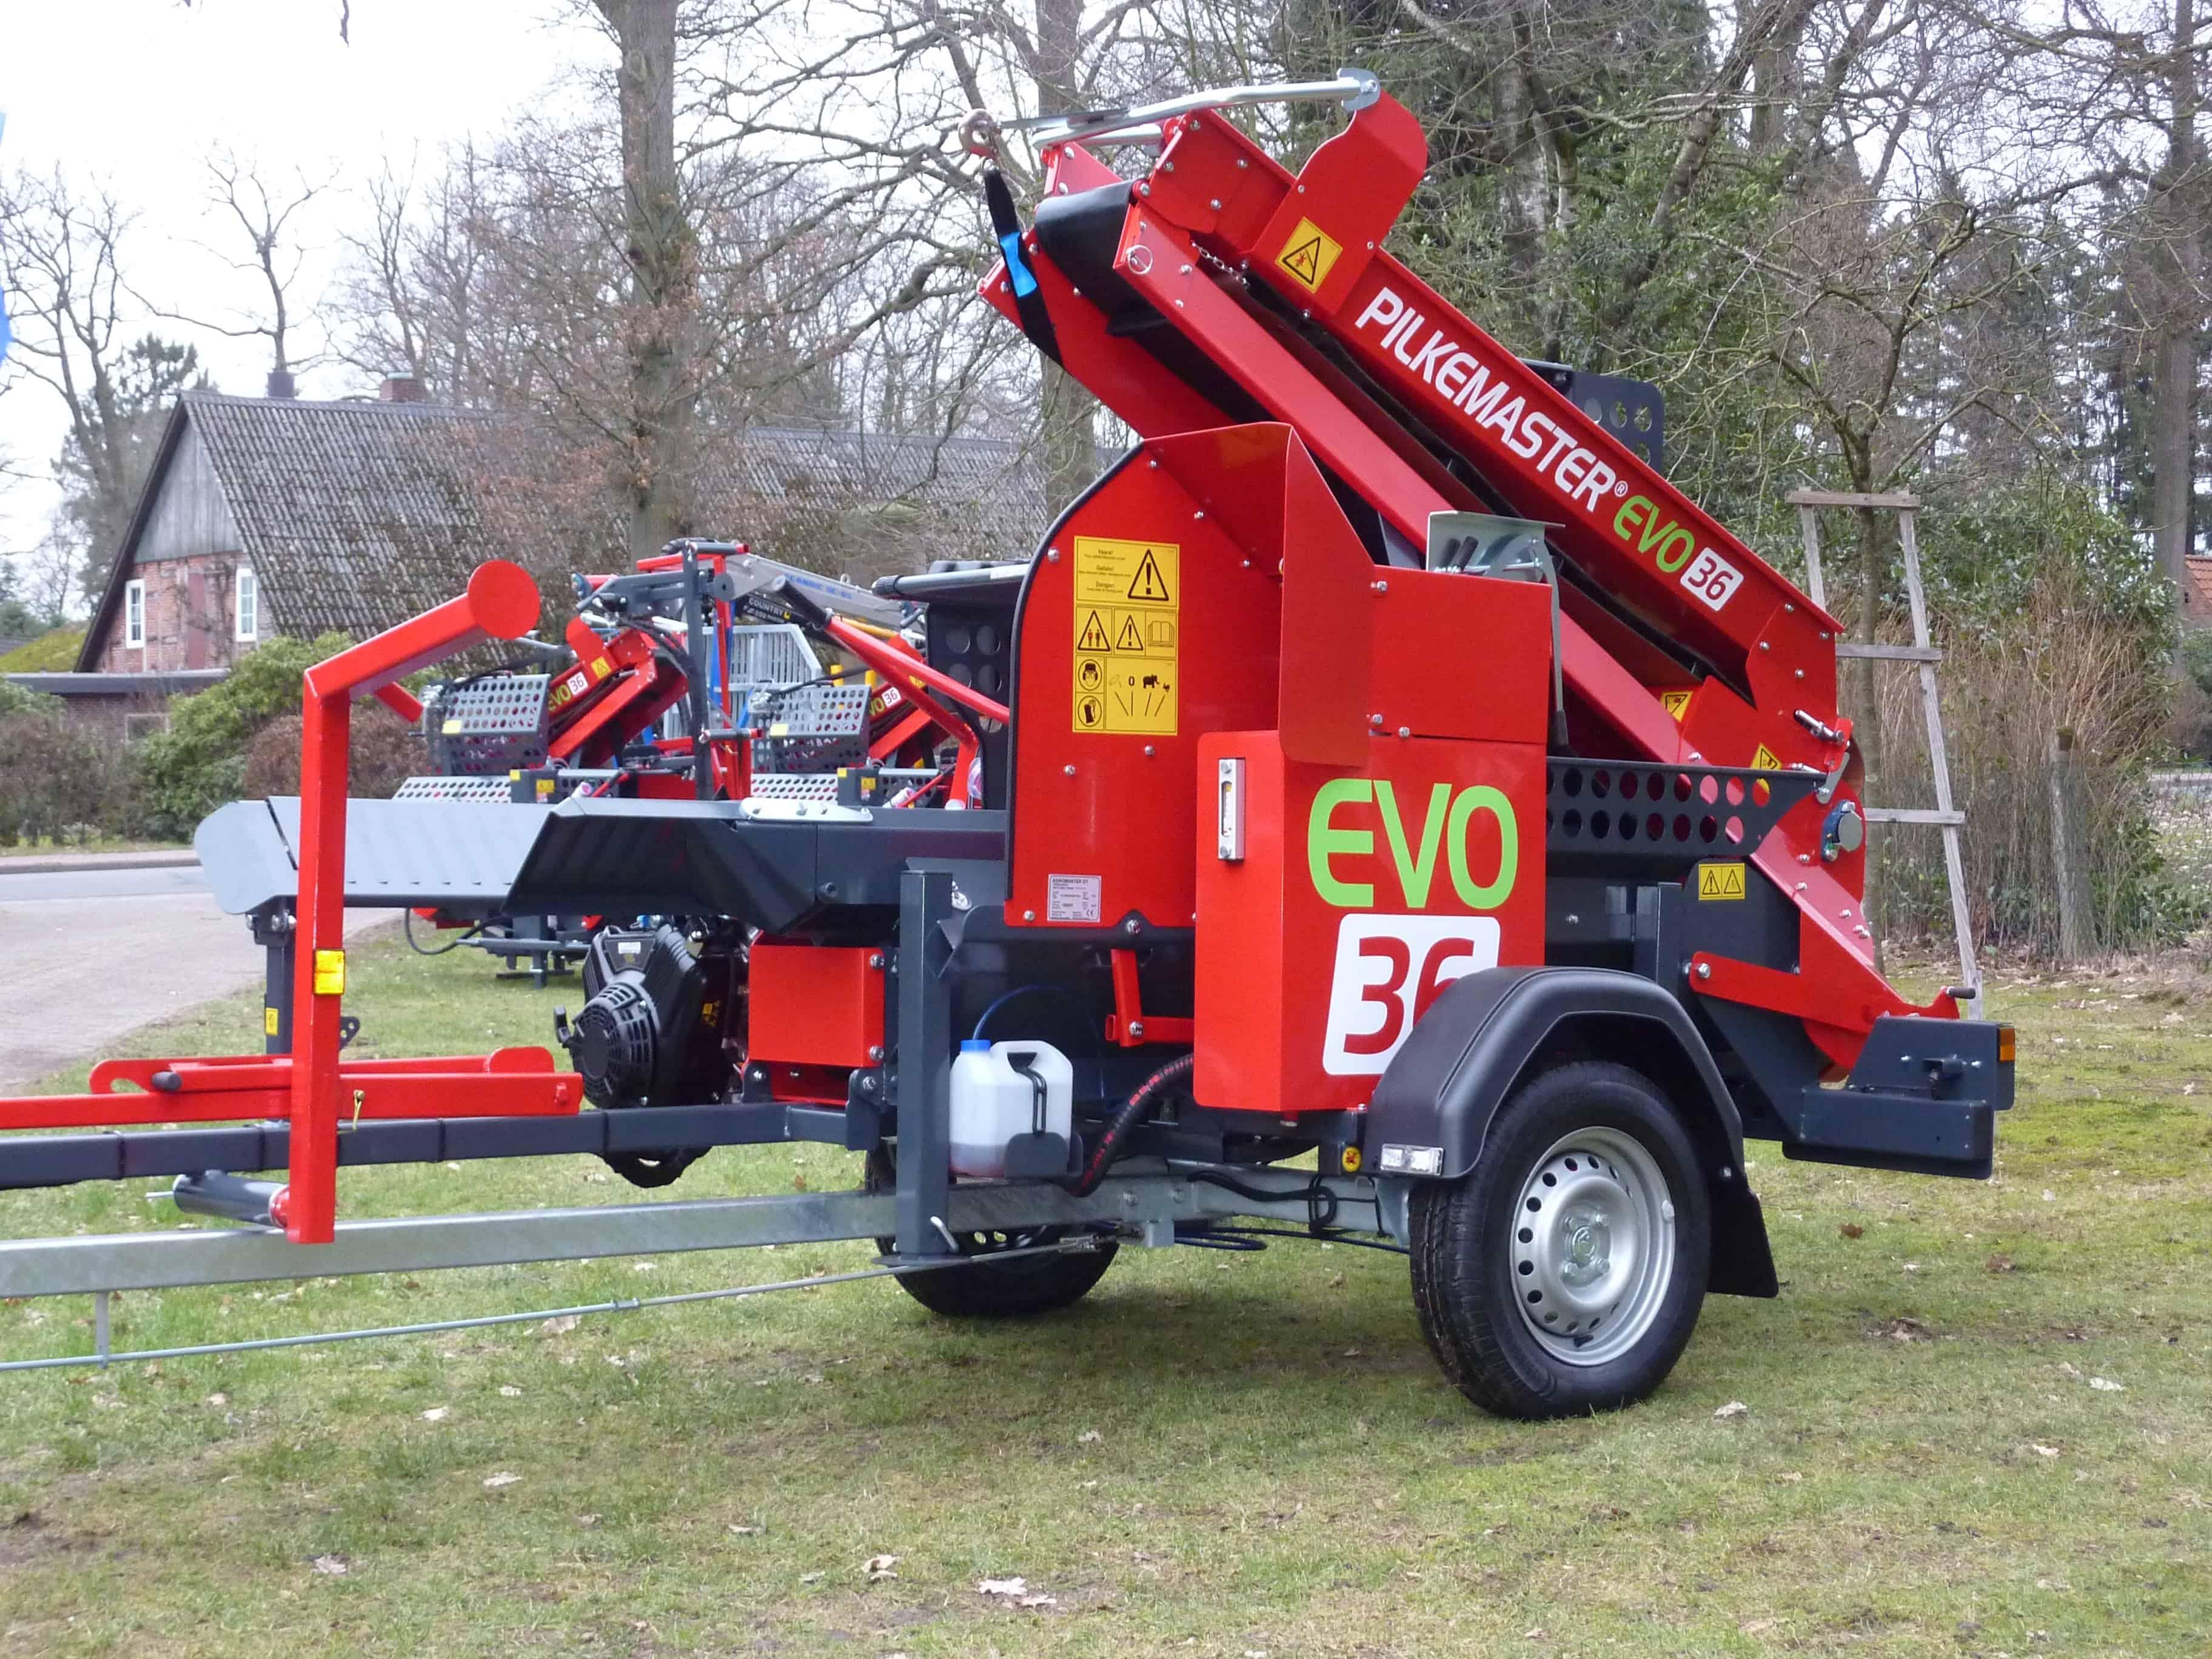 PILKEMASTER® EVO 36 Sägespaltautomat mobil bei Forsttechnik Könemann GmbH, 29643 Neuenkirchen